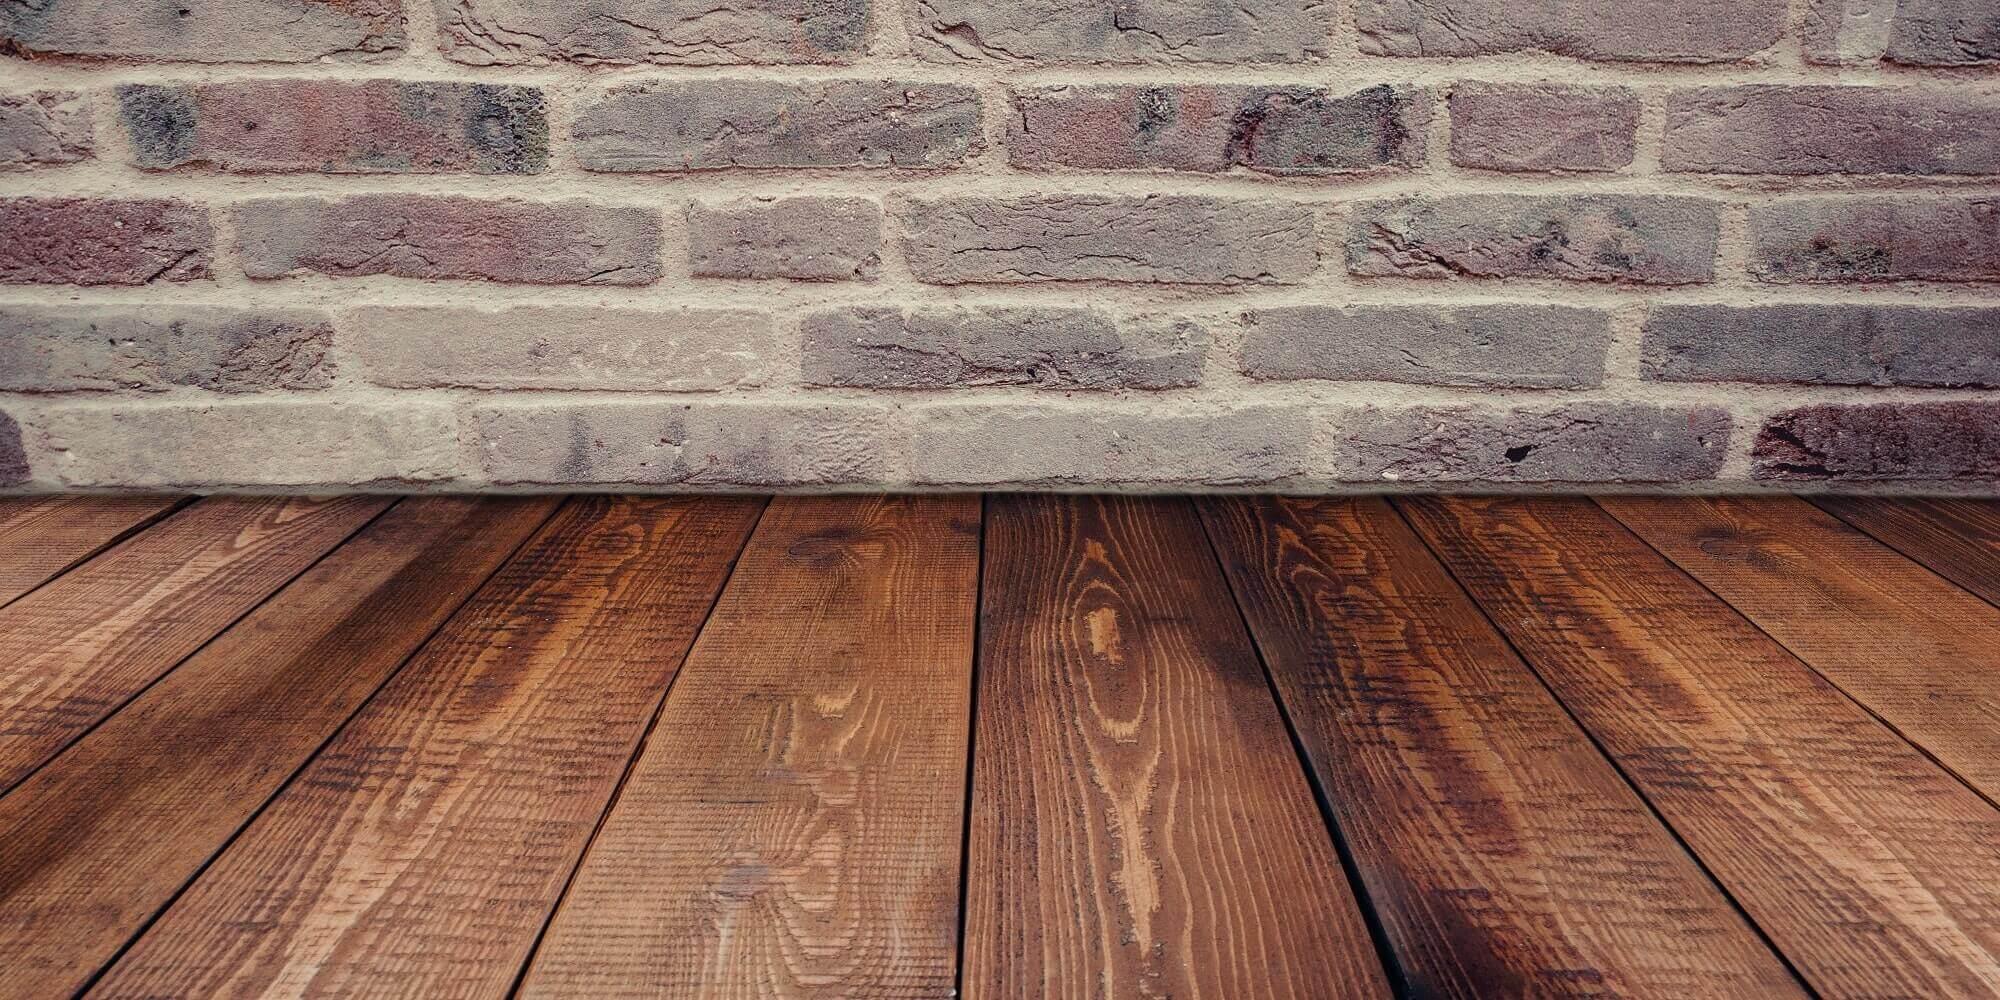 Jaka podłoga do mieszkania – drewno, panele, kafle